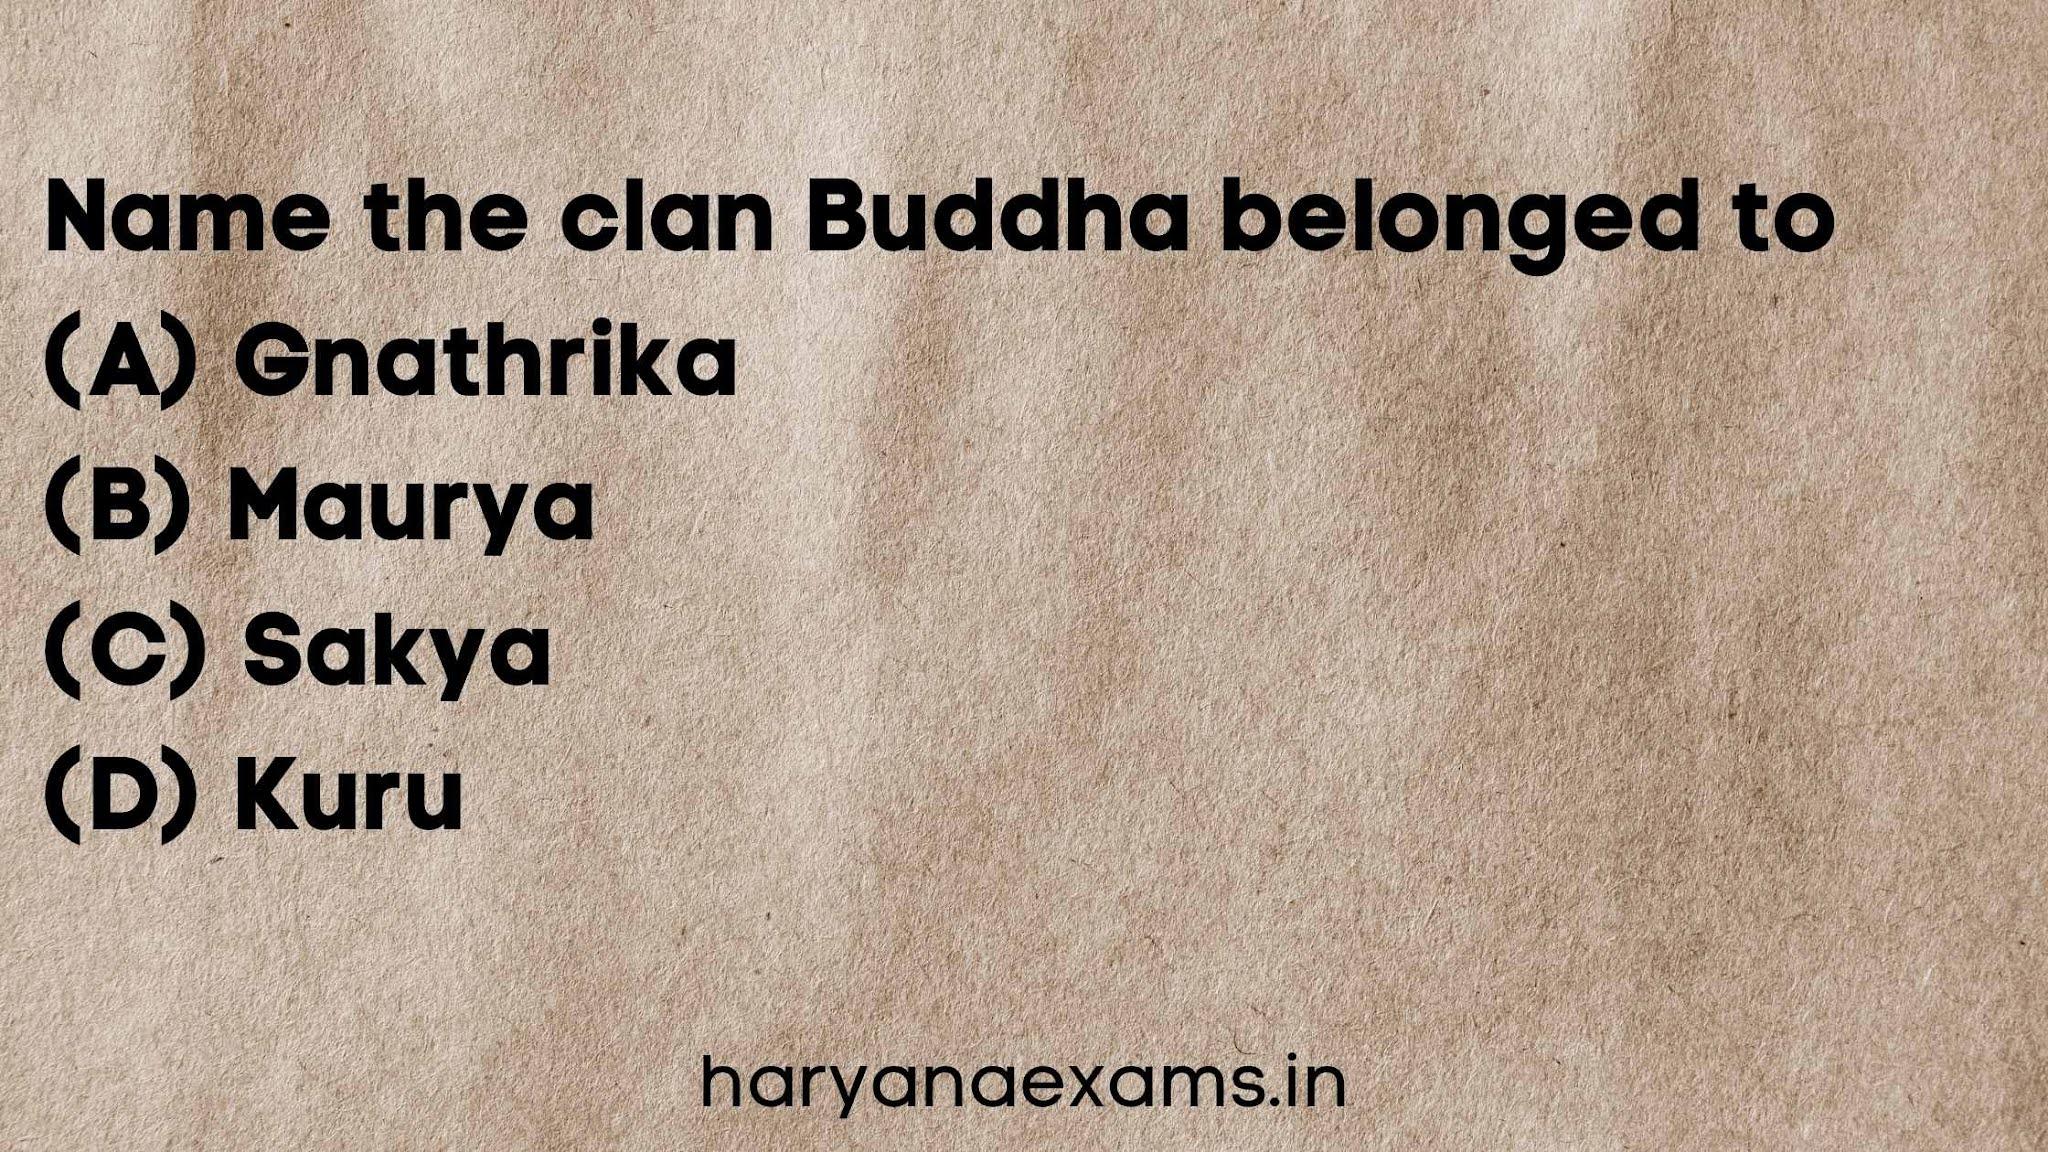 Name the clan Buddha belonged to   (A) Gnathrika   (B) Maurya   (C) Sakya   (D) Kuru